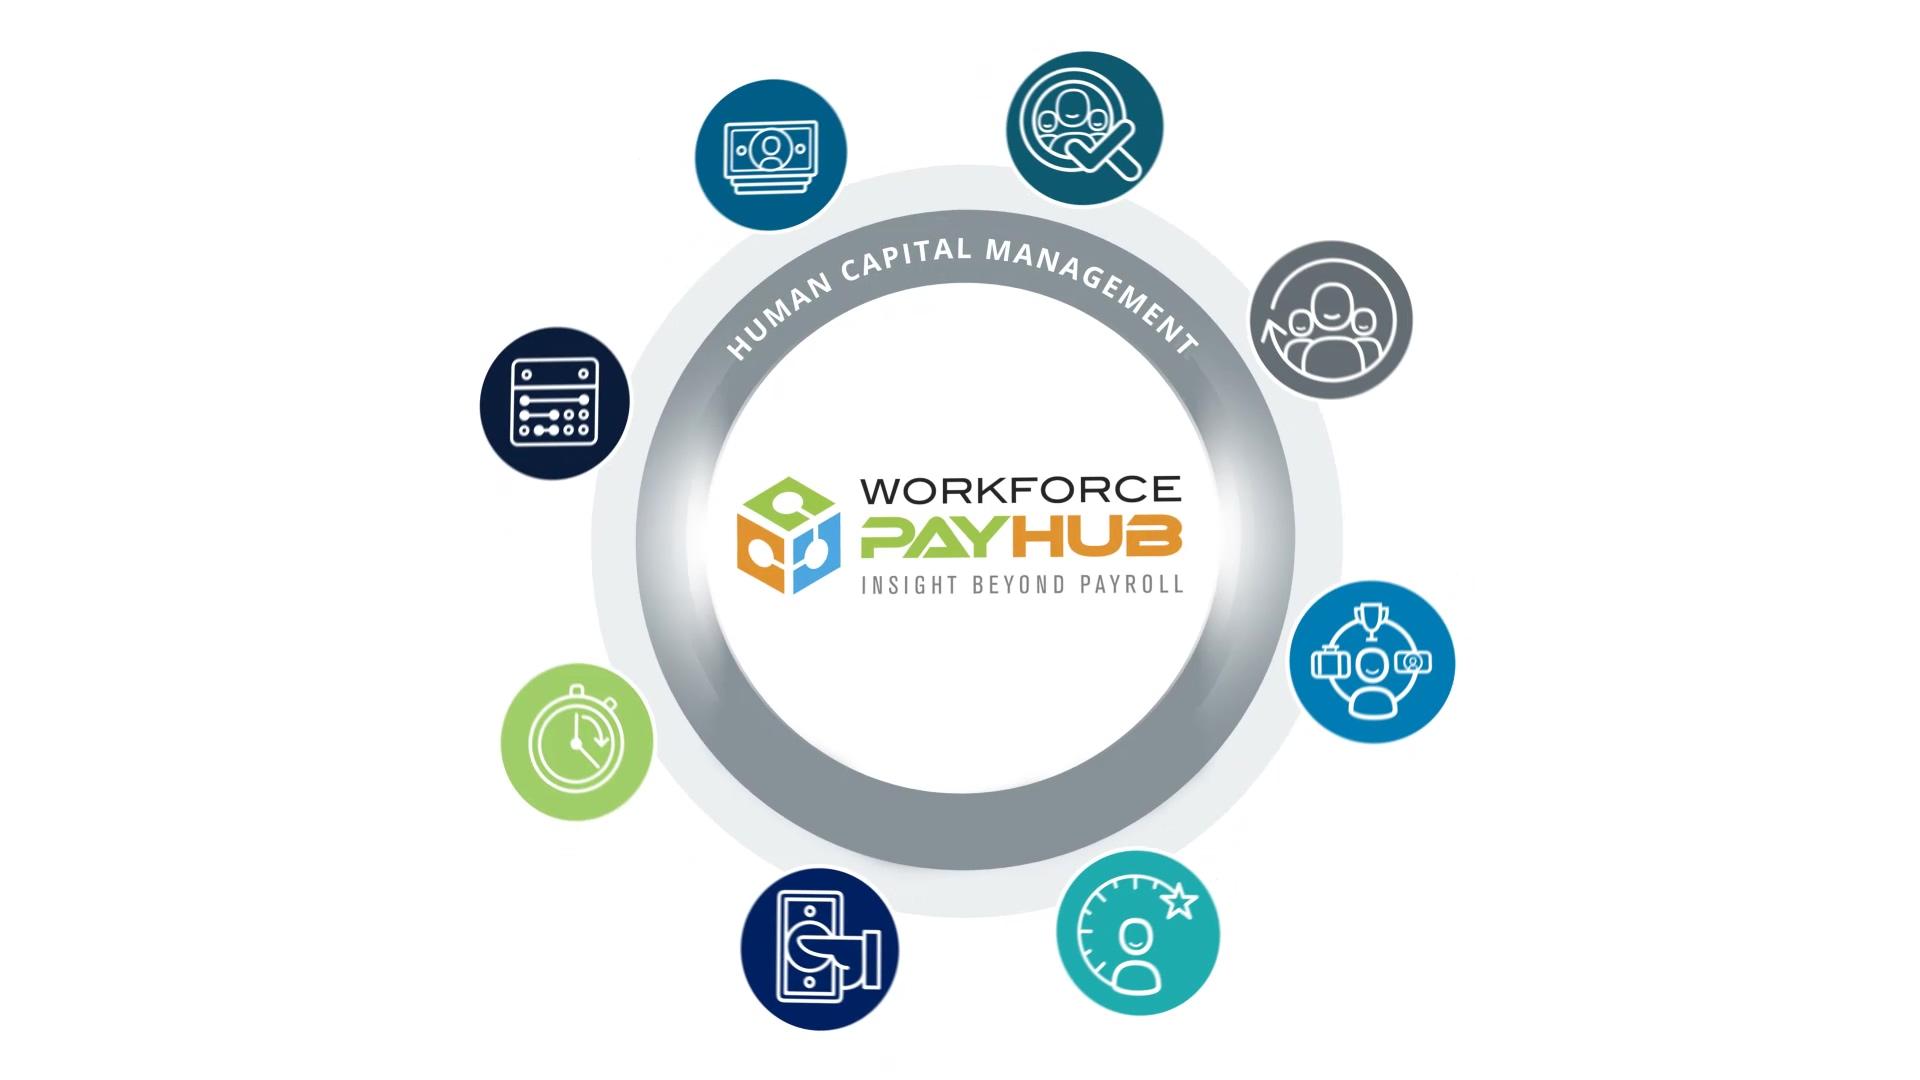 Workforce Payhub - WFR Video